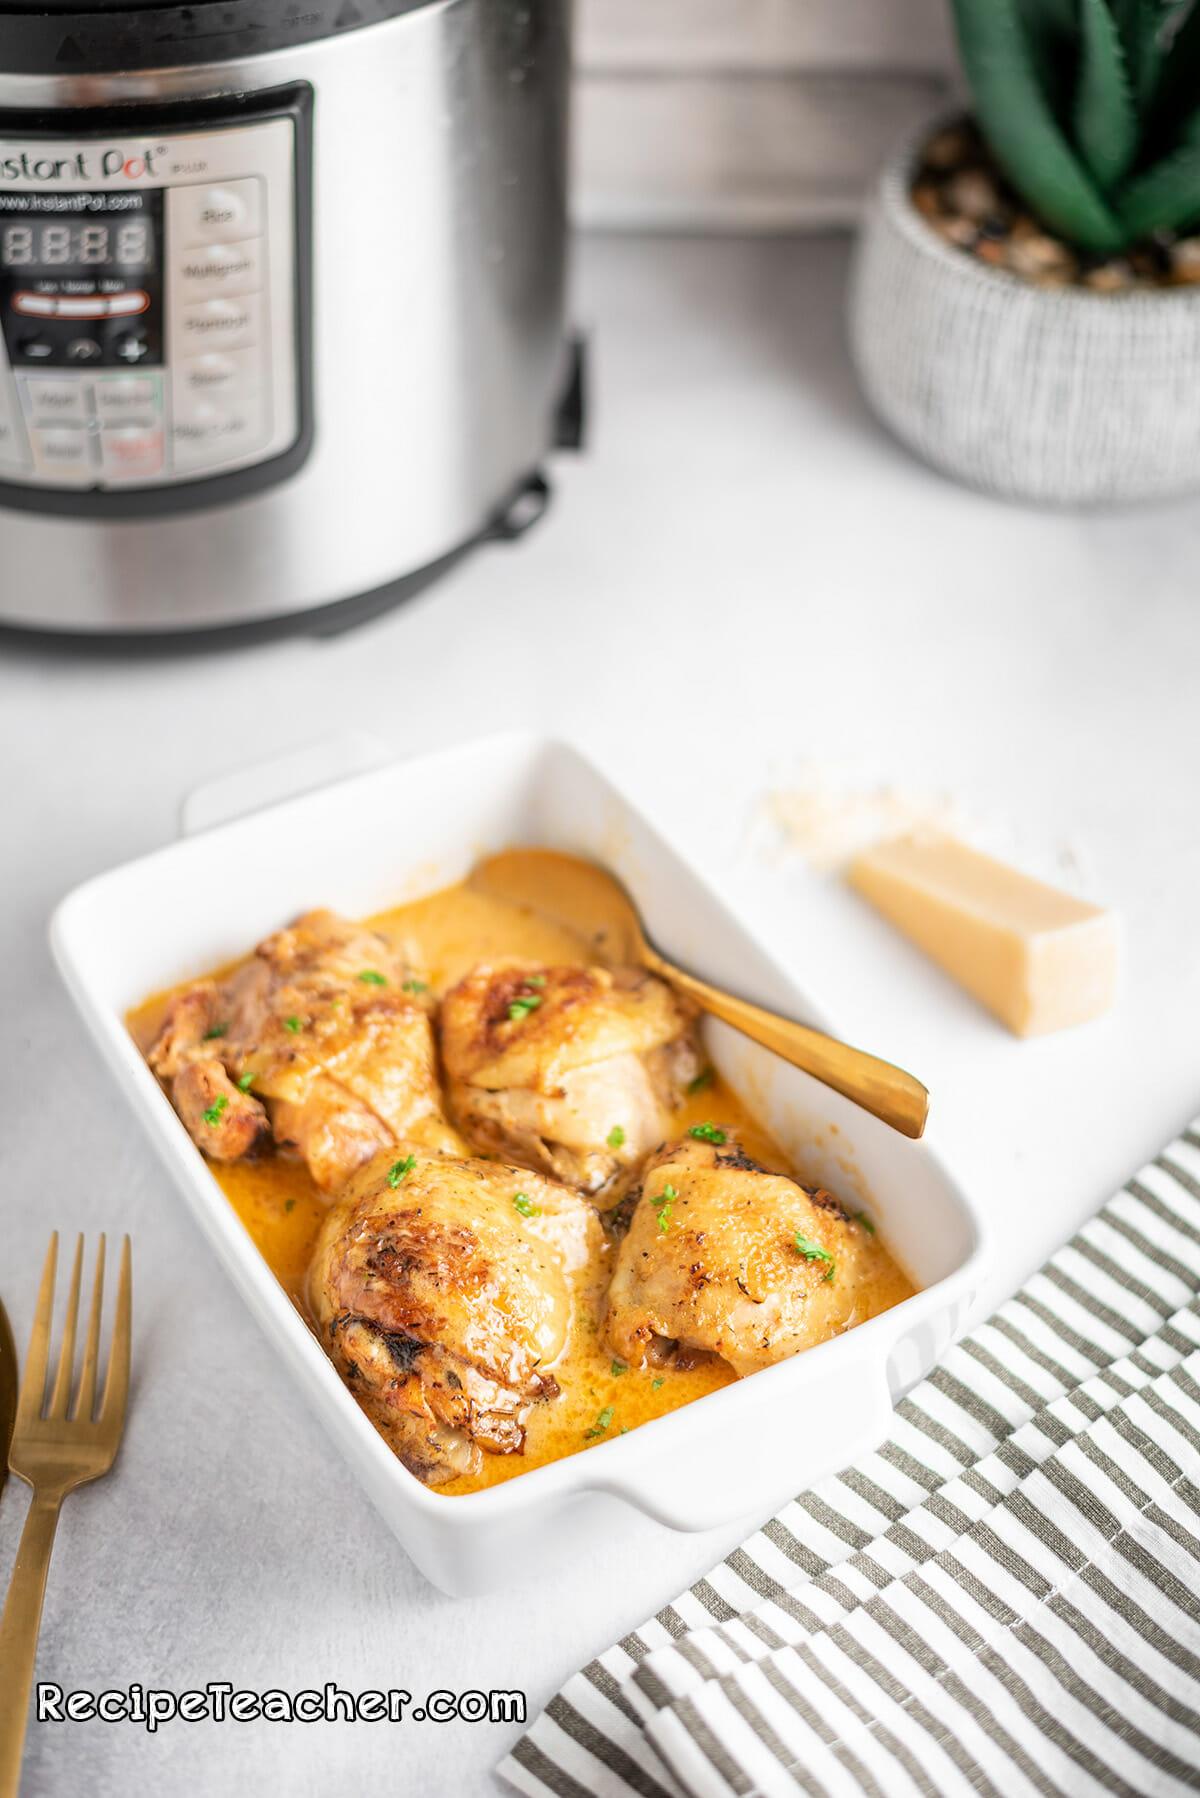 Recipe for Instant Pot creamy garlic chicken thighs